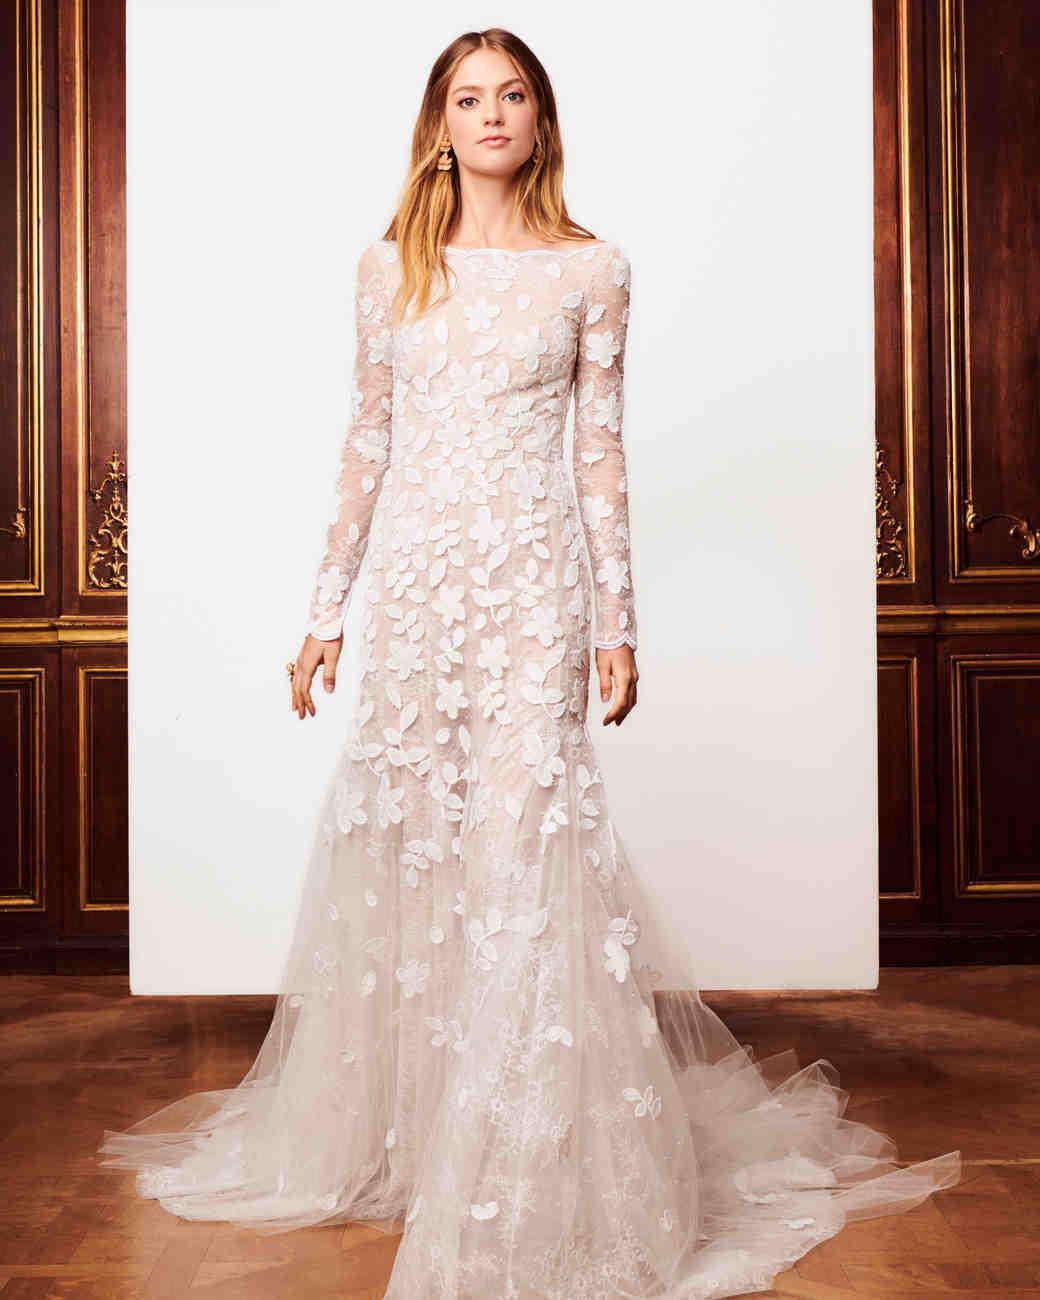 fb12b85fc4d30 صور أجمل فساتين زفاف فخمة وأنيقة لعروس عام 2019